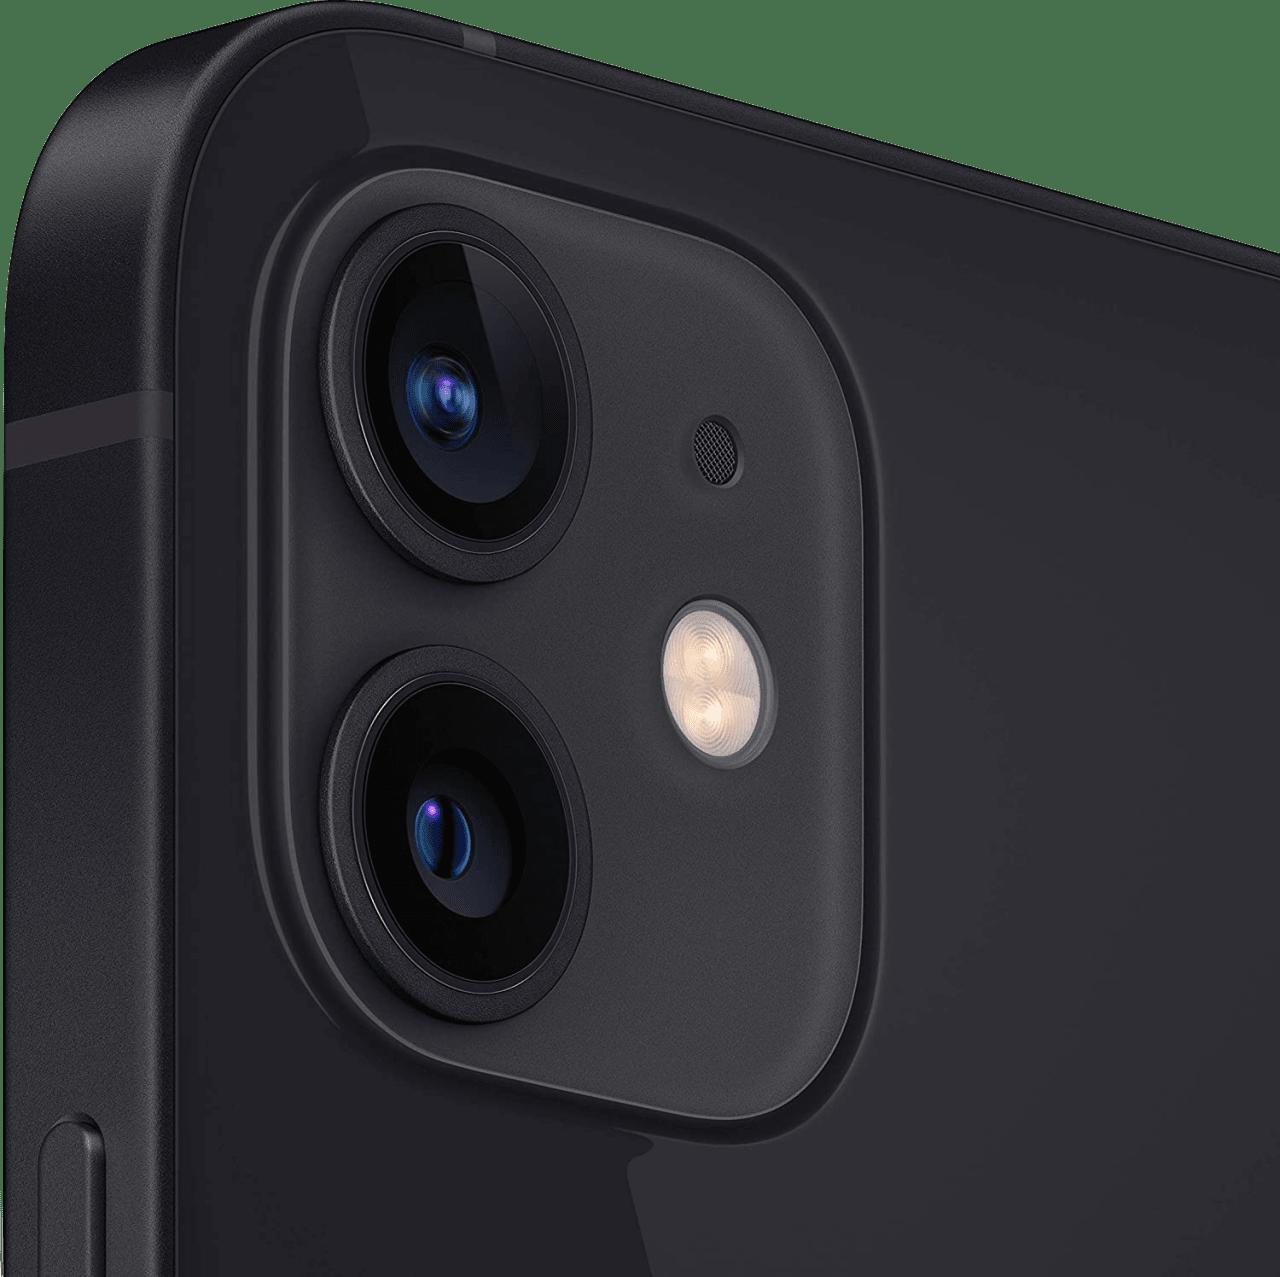 Black Apple iPhone 12 mini 256GB.4